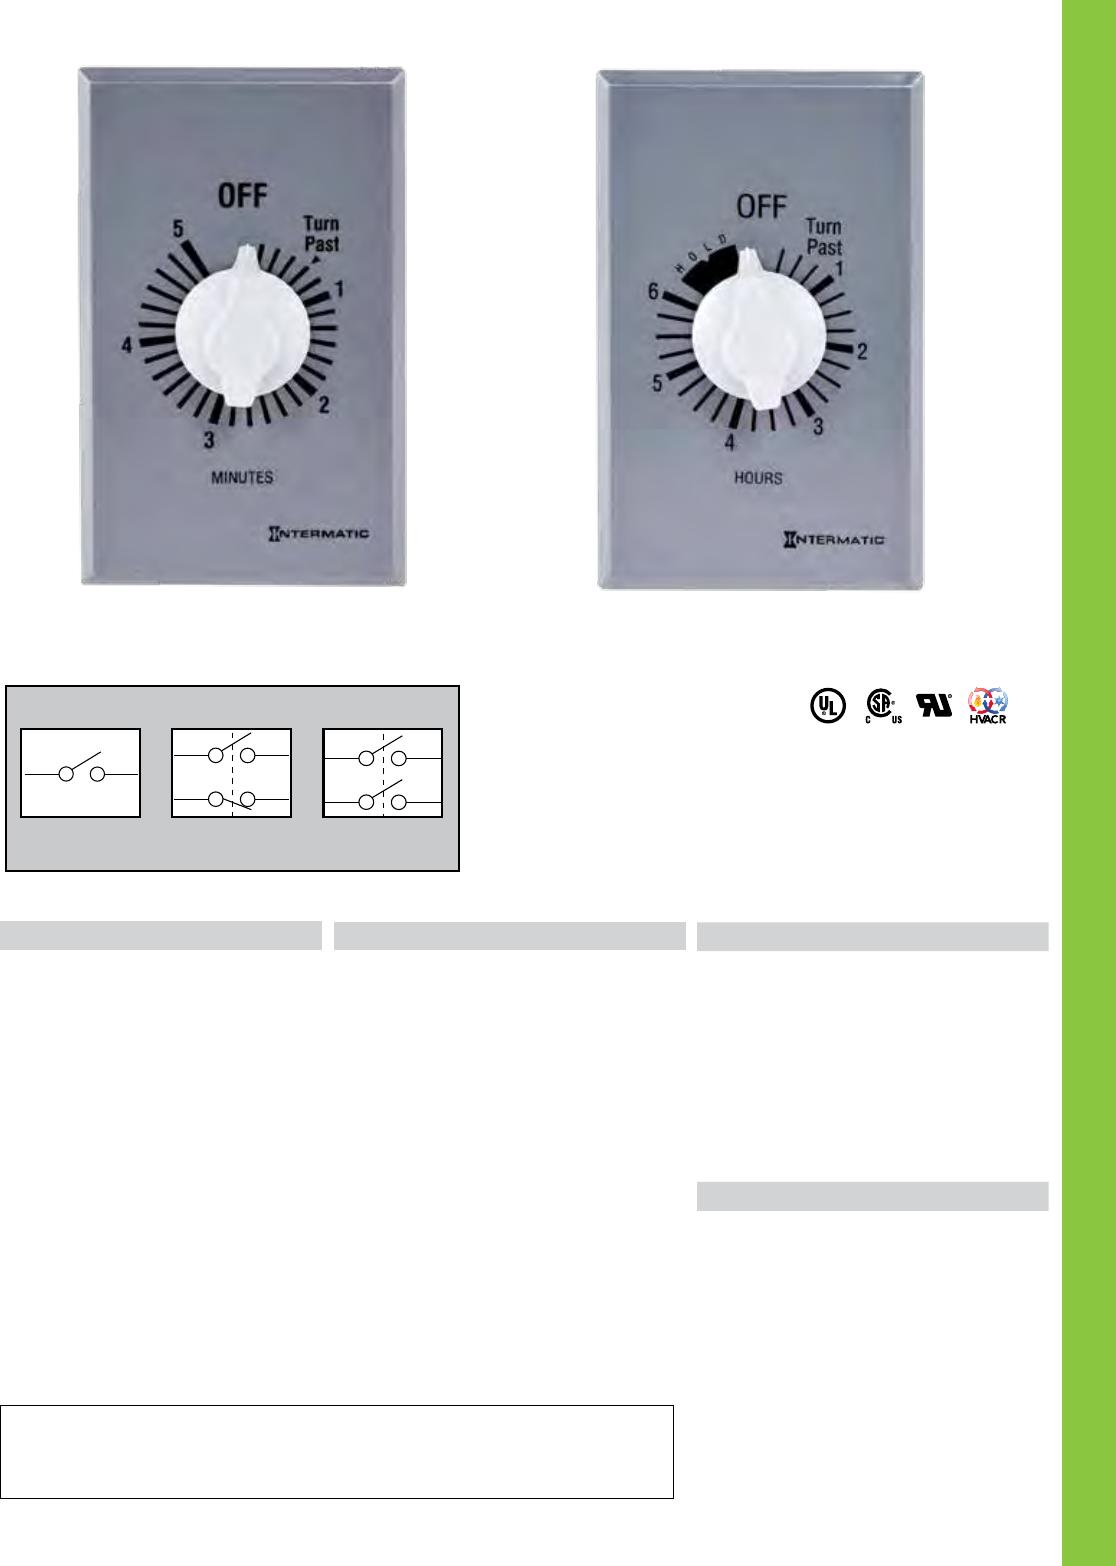 Tools & Home Improvement Intermatic INT FD30MH 30MIN SPR WND TIMER ...